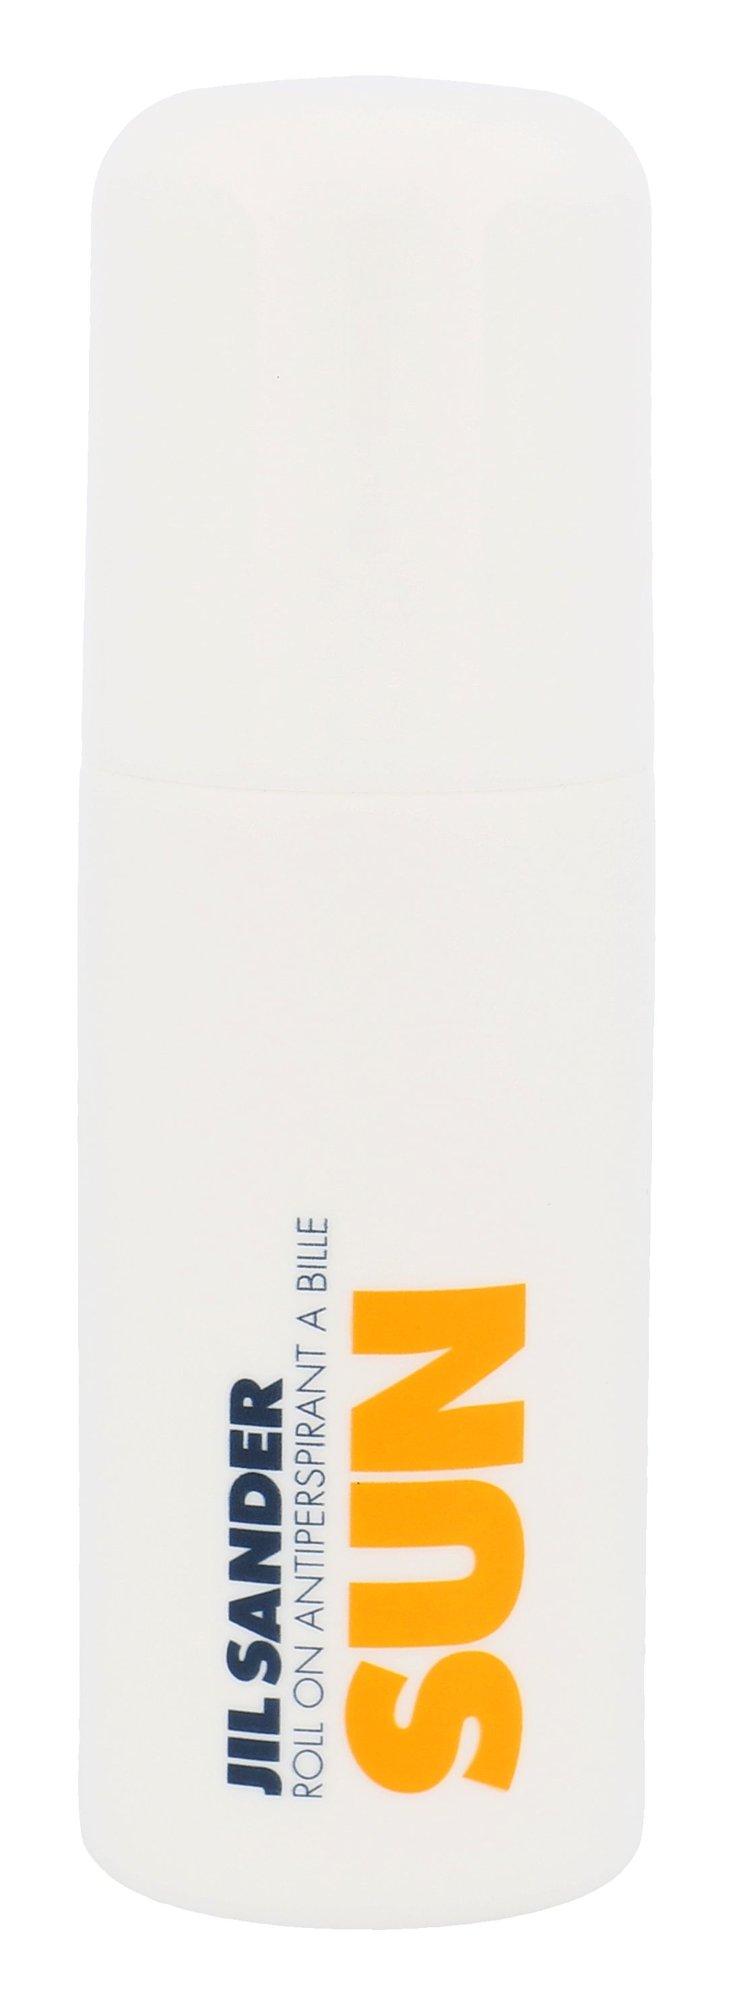 Jil Sander Sun Deodorant 50ml